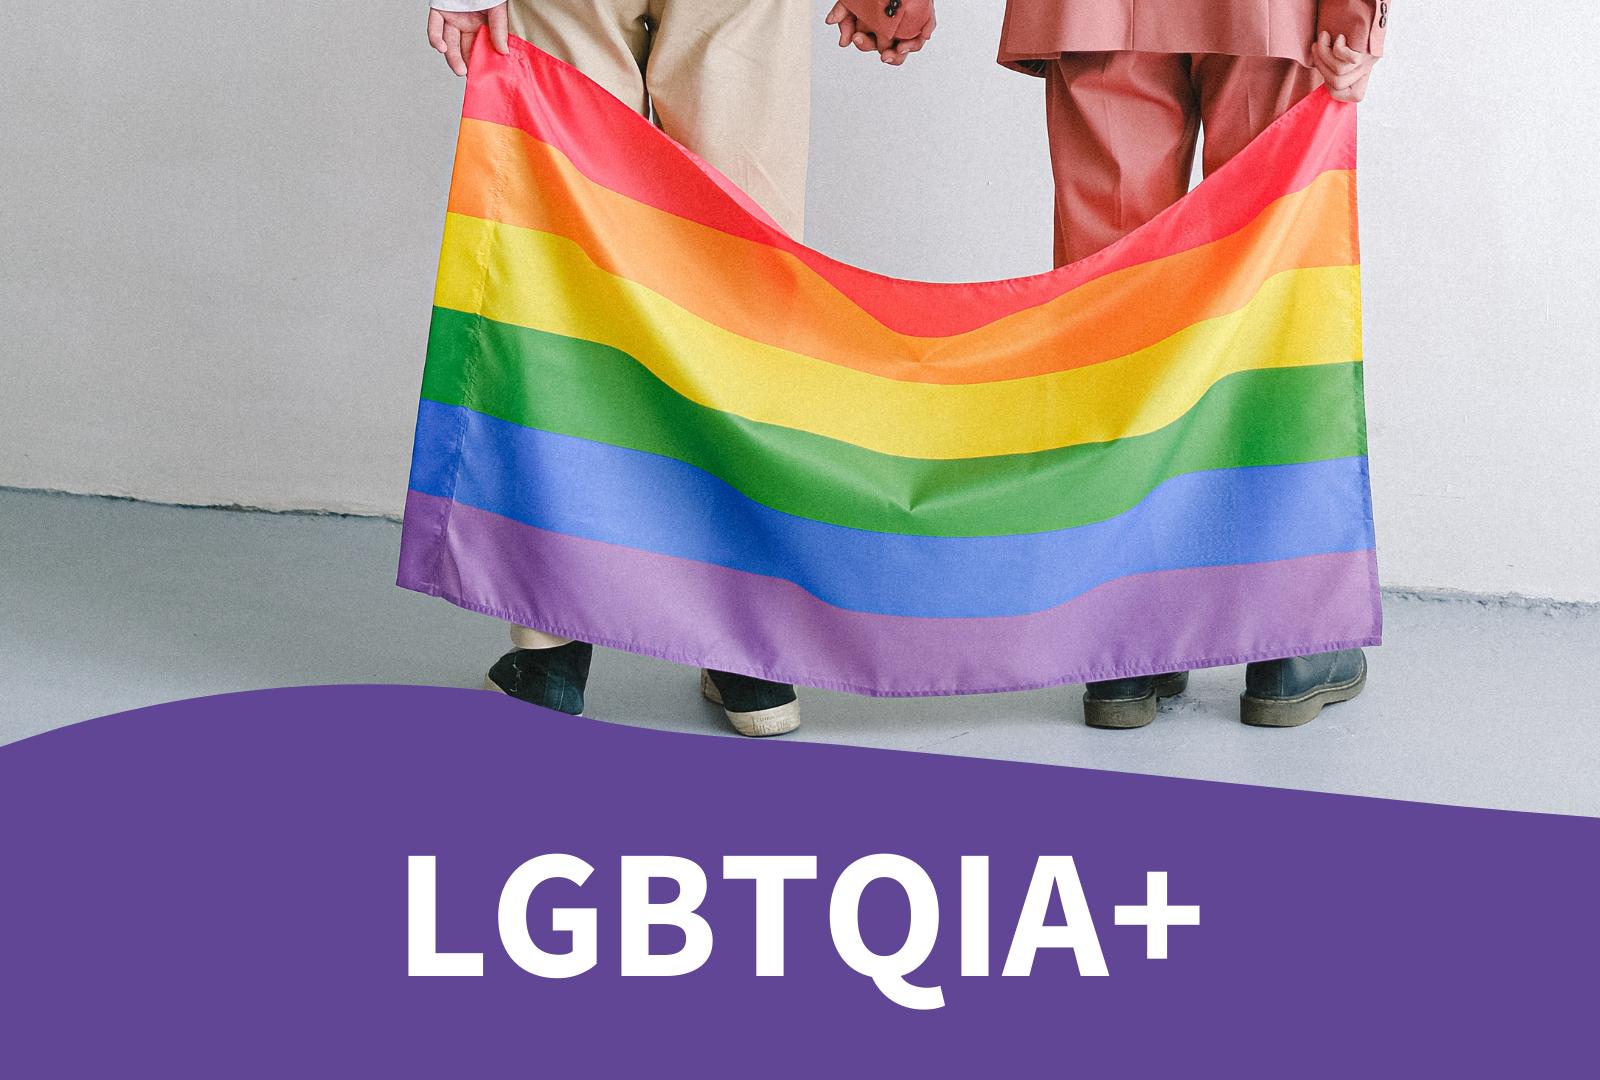 Photo two people behind a pride flag